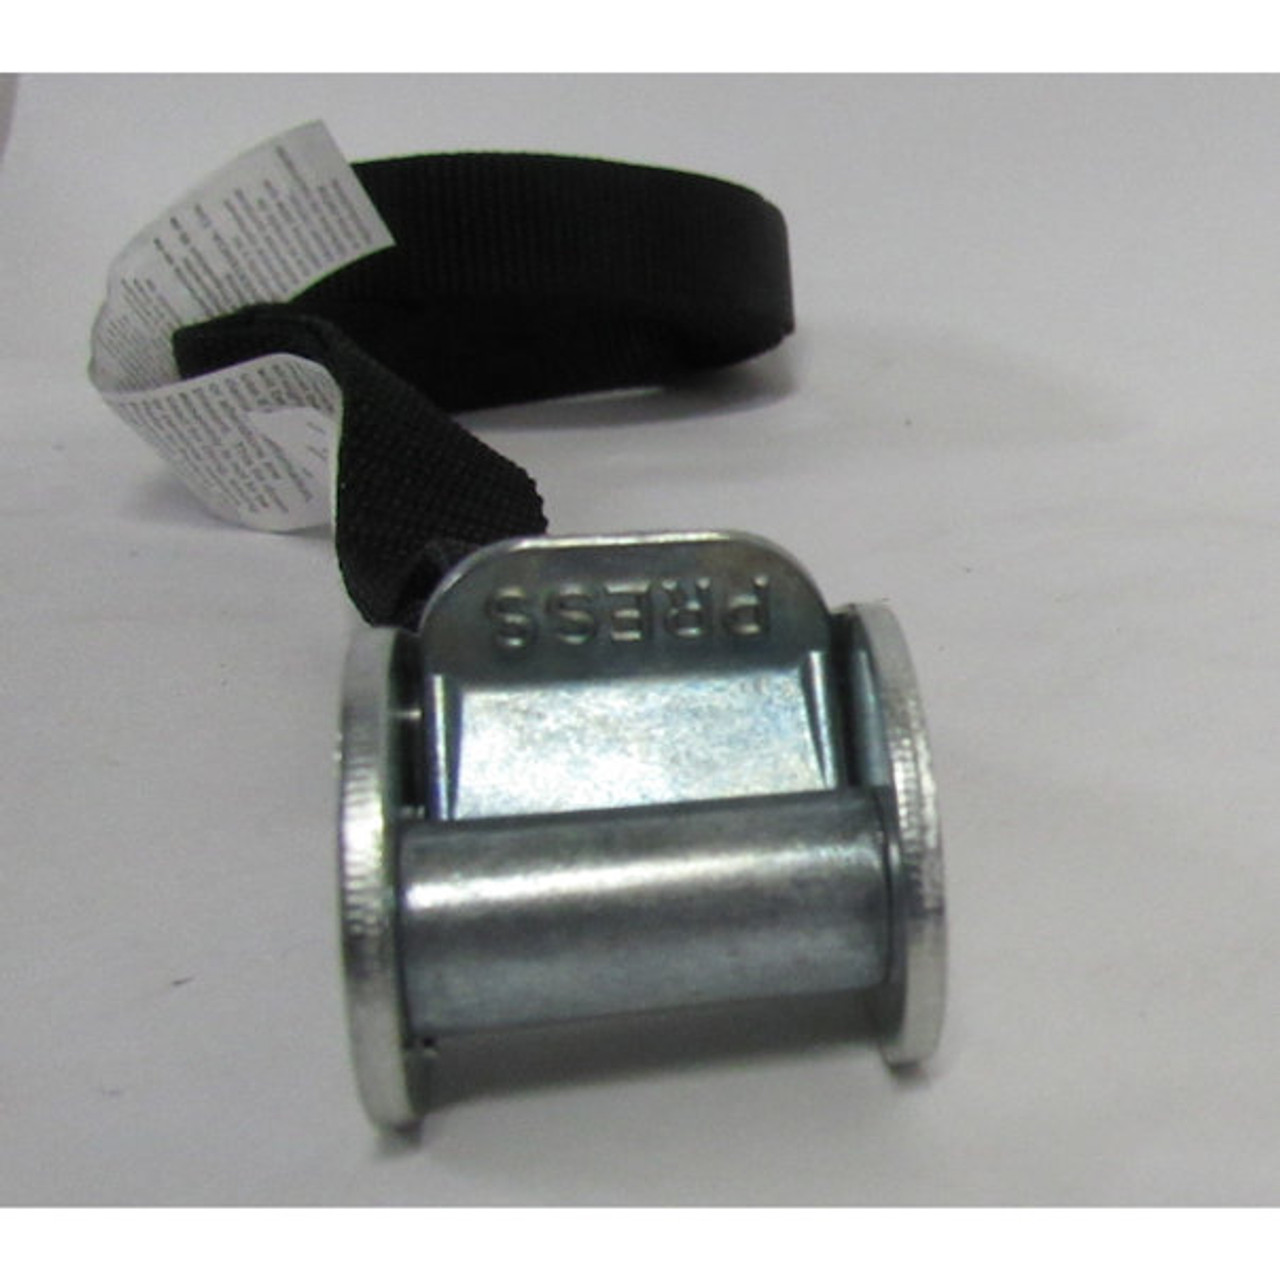 PROGRIP 512097 9 FT Lashing Strap Aero Cam Buckle Black 6-Pack